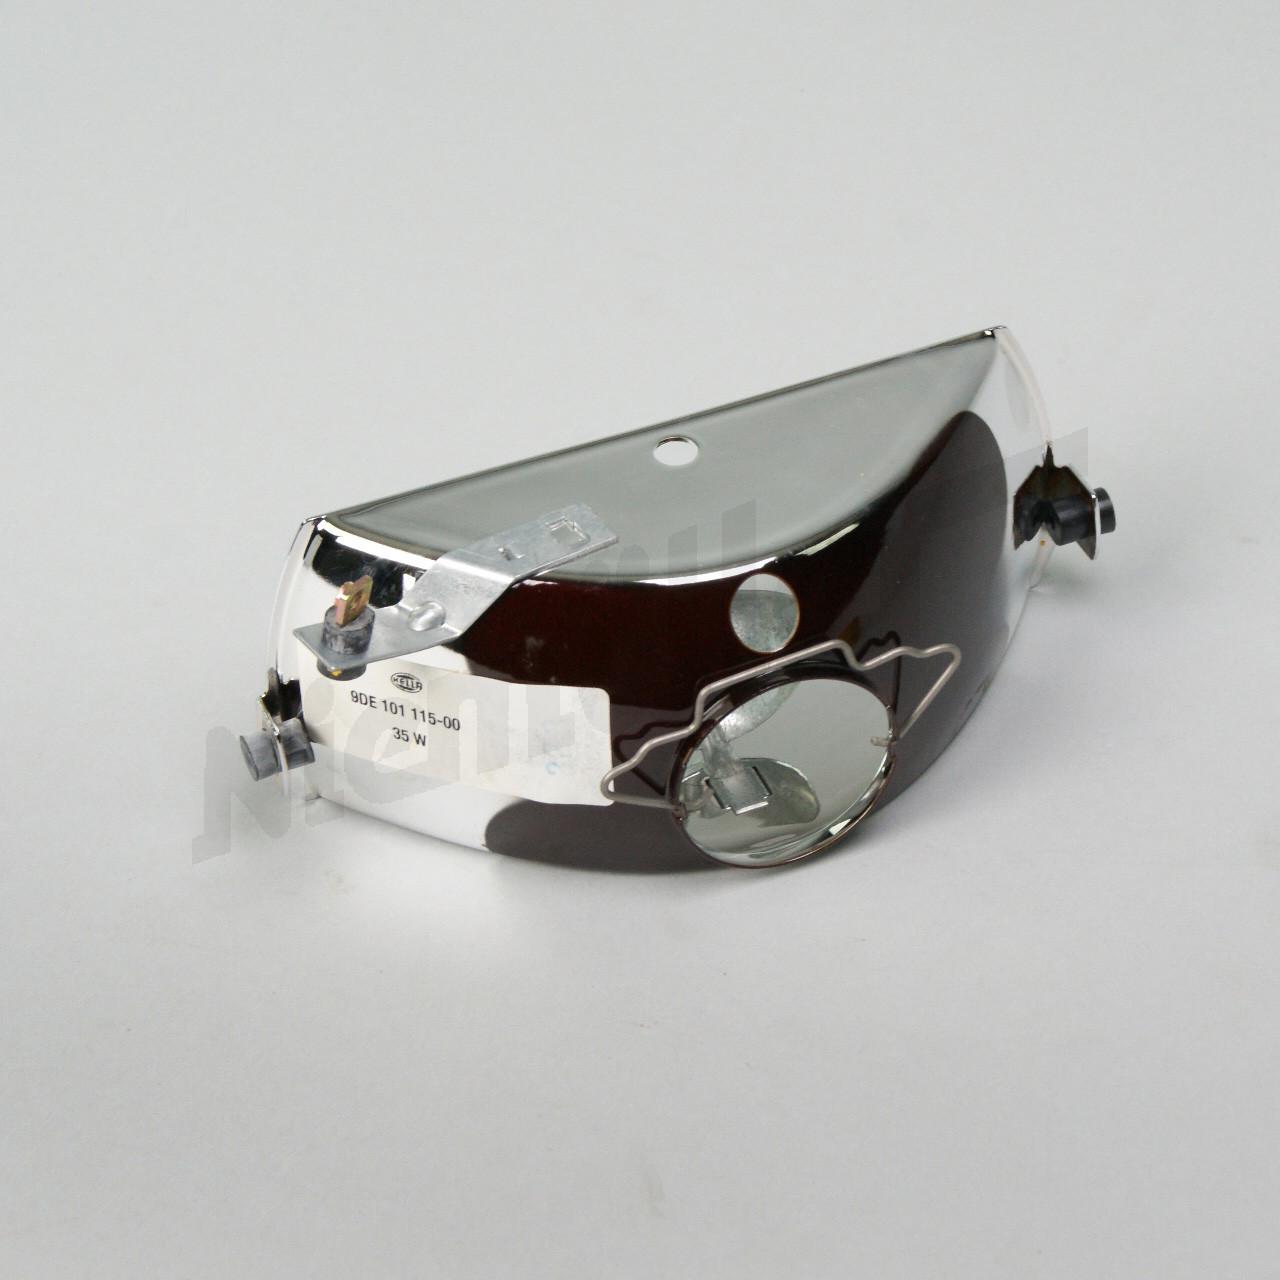 reflektor nebelscheinwerfer 200d 8 mercedes benz w115. Black Bedroom Furniture Sets. Home Design Ideas